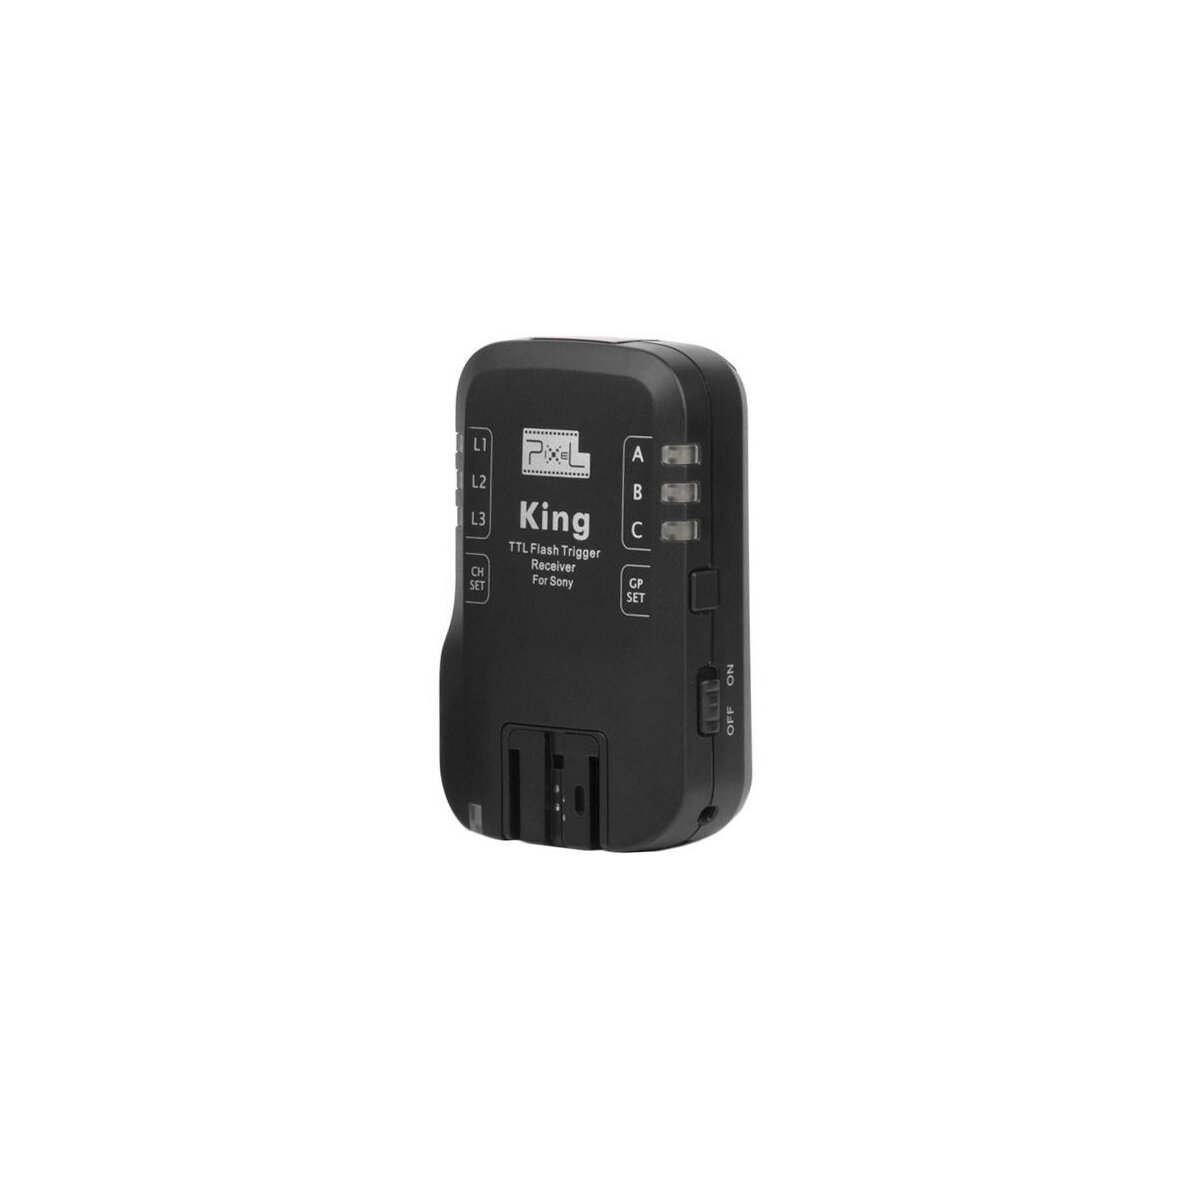 PIXEL KING E-TTL Funk-Blitzauslöser Zusatzempfänger kompatibel mit Sony Blitzgeräten und Sony DSLR (King RX)